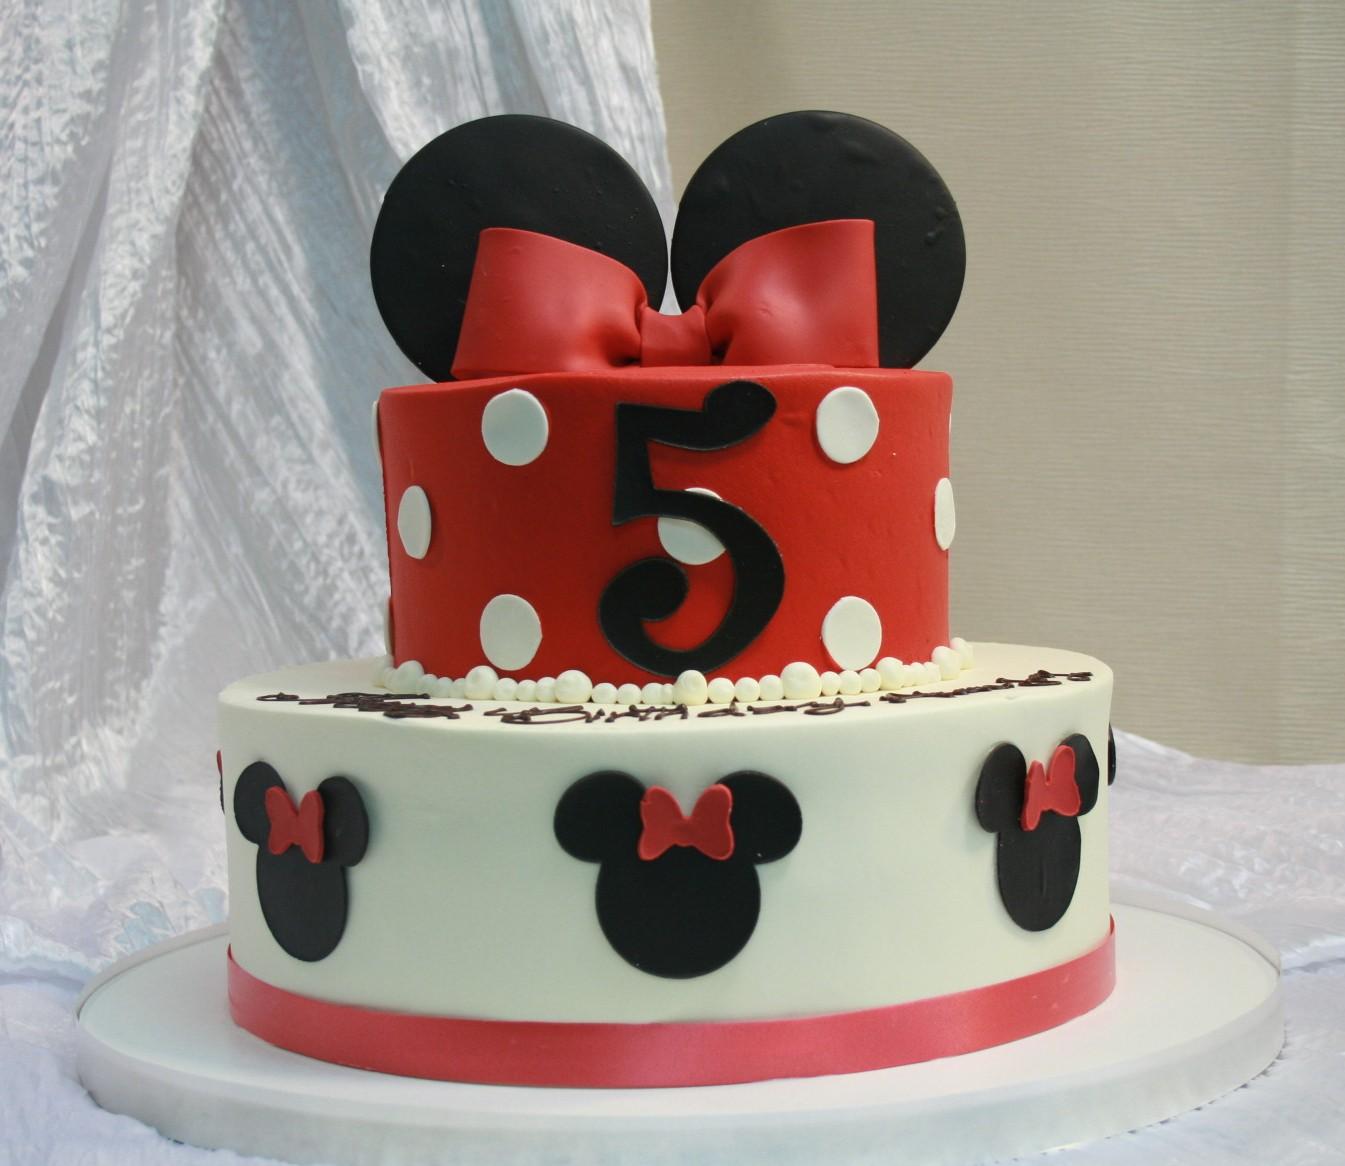 2 Tier Minnie Mouse Ears Cake